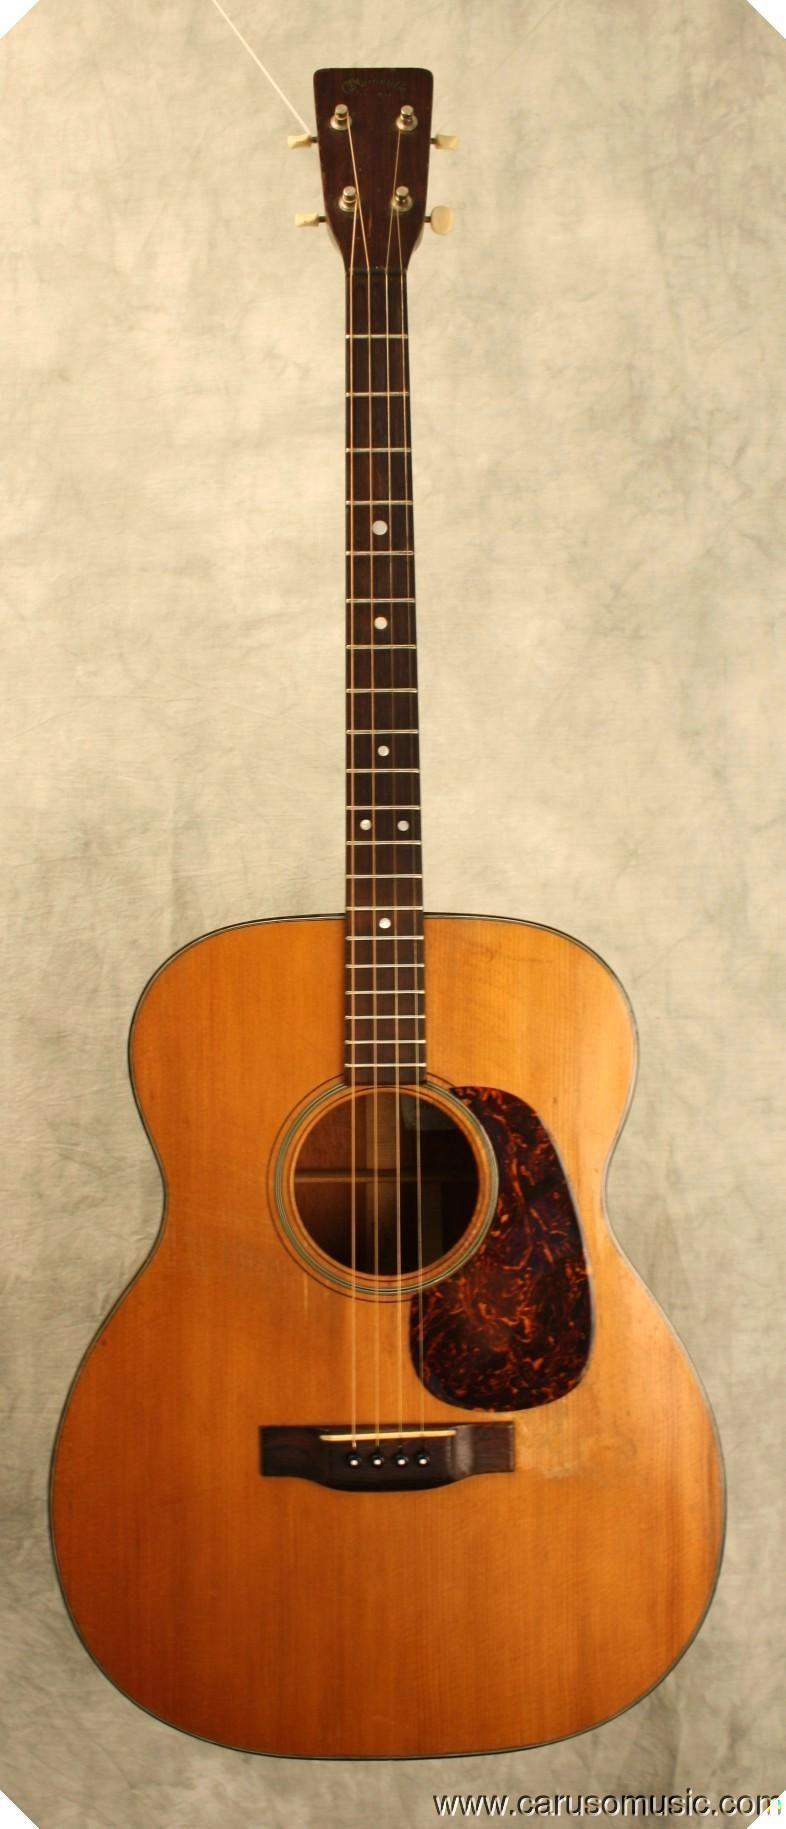 Vintage Martin Guitars Vintage Acoustic Guitar 163963902391032190 Martin O18t Vintage 1947 Guitar Inlay Martin Guitar Acoustic Guitar